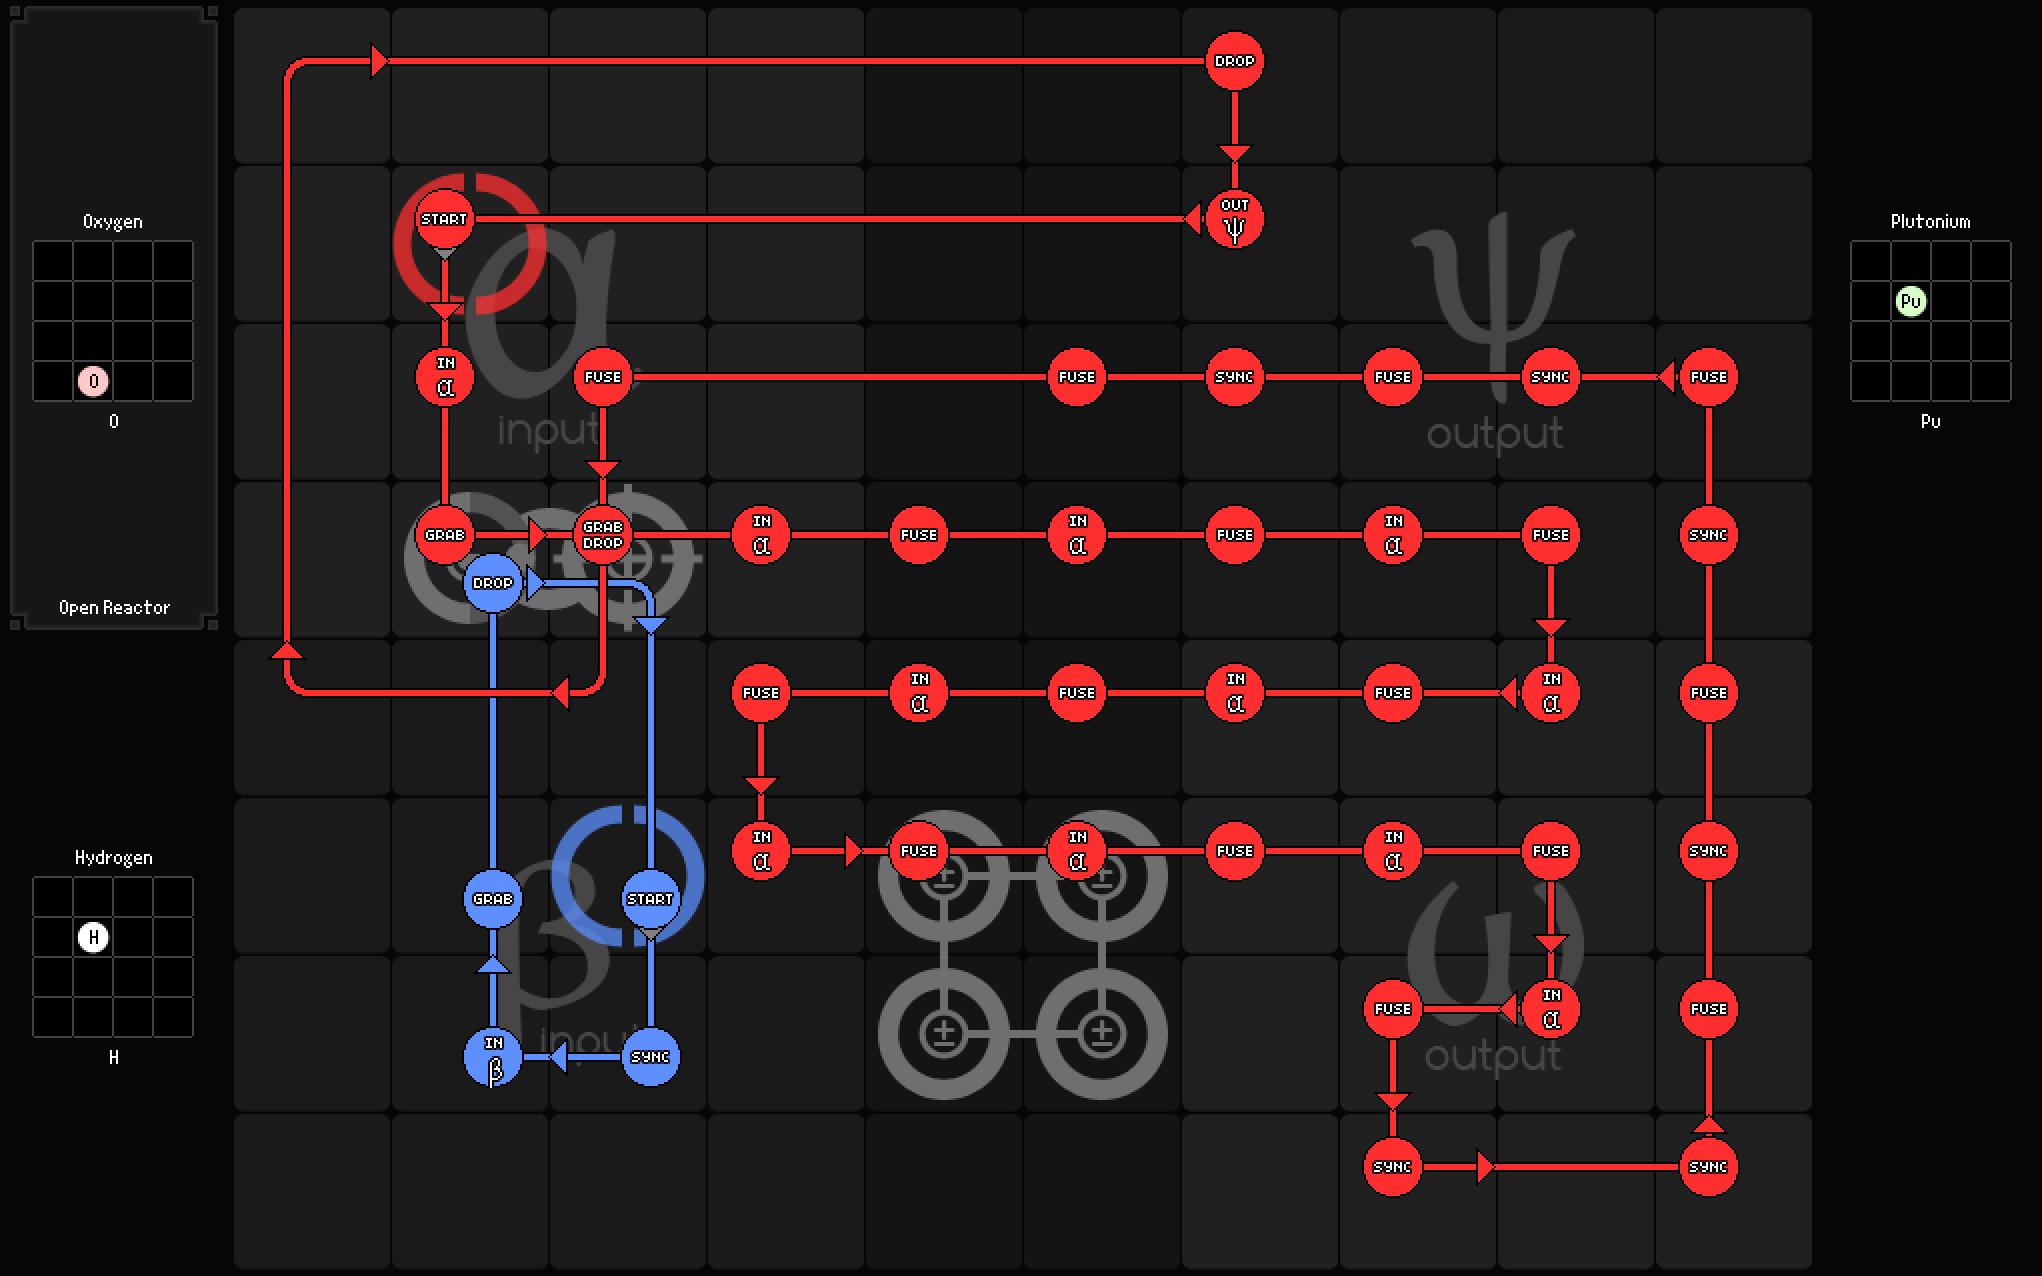 1_Story_Mode/5_Sikutar/SpaceChem-5.6.a-boss/Reactor_4.png